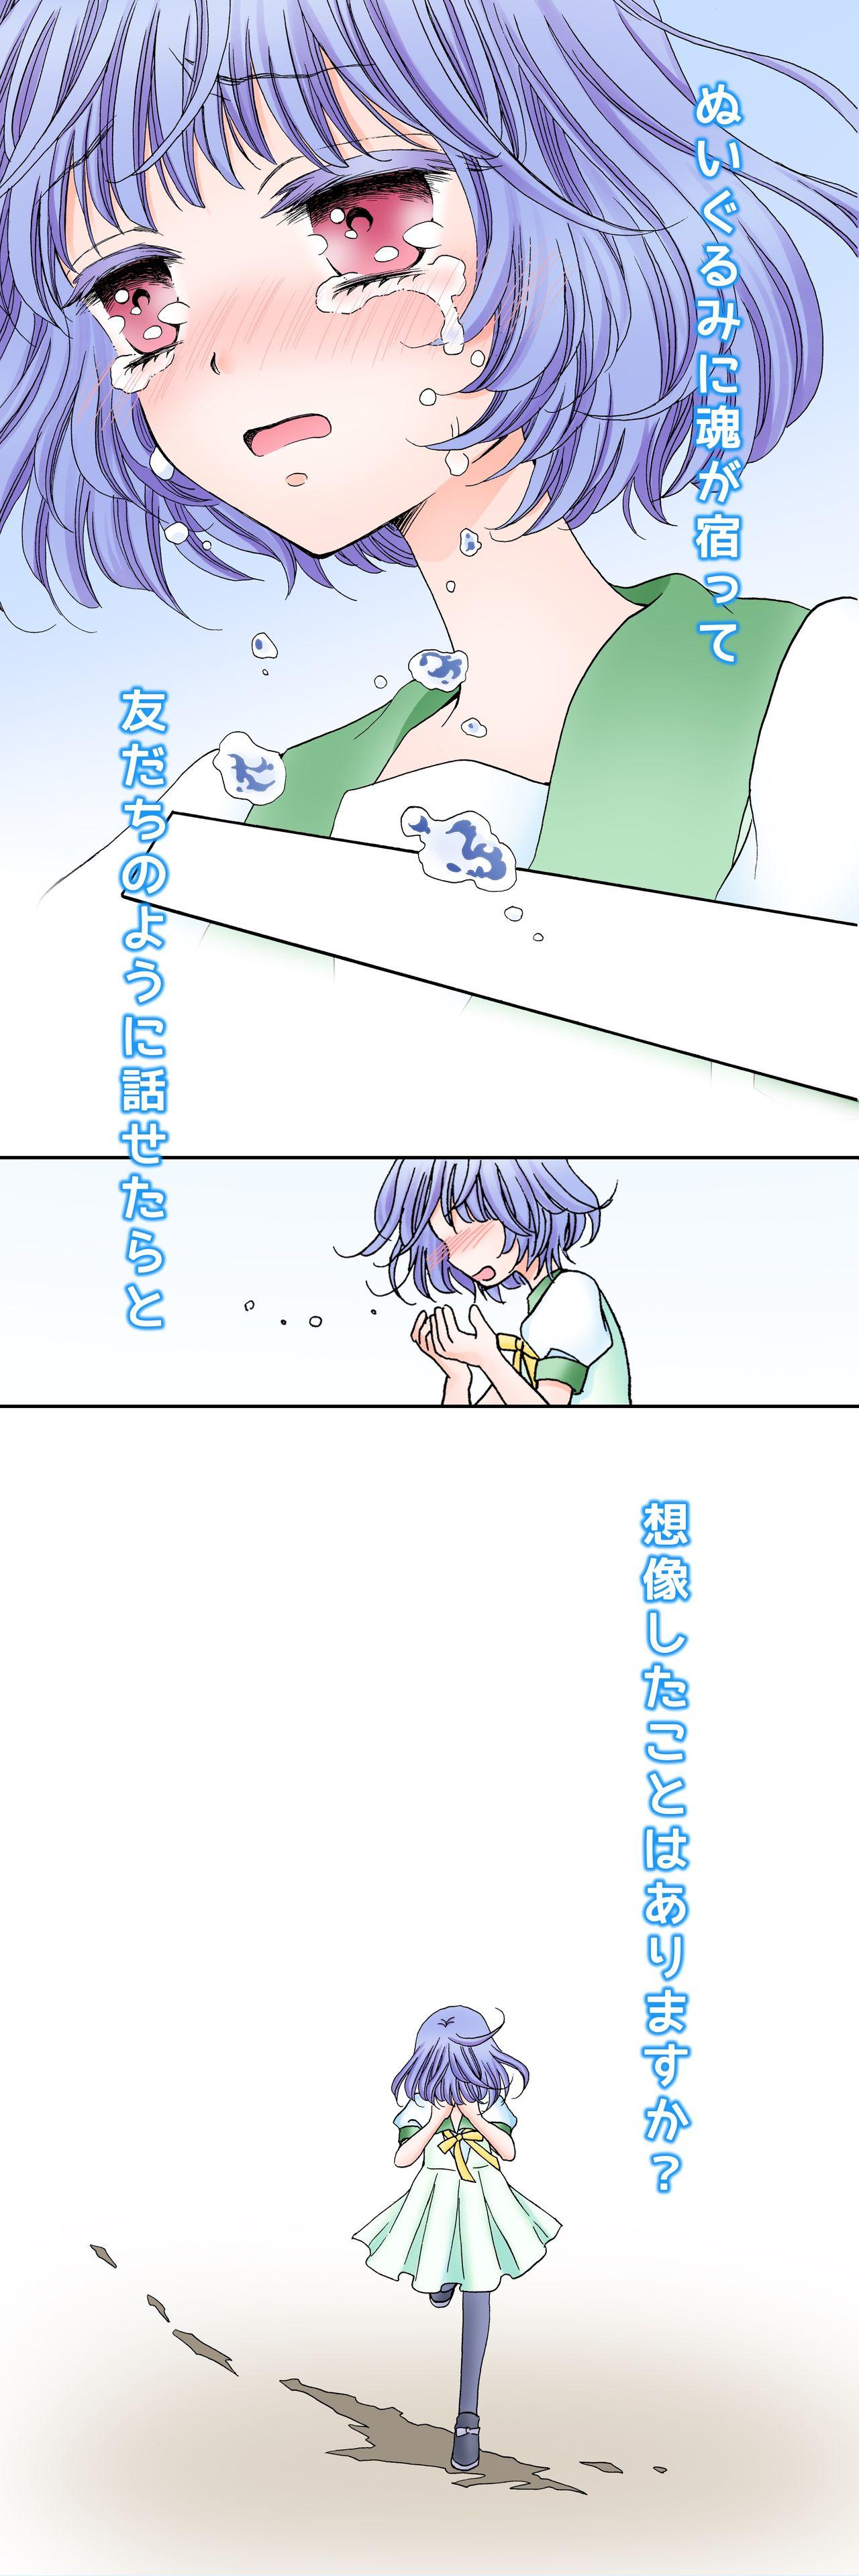 BKS_yokoku_KAKO01 - 01002